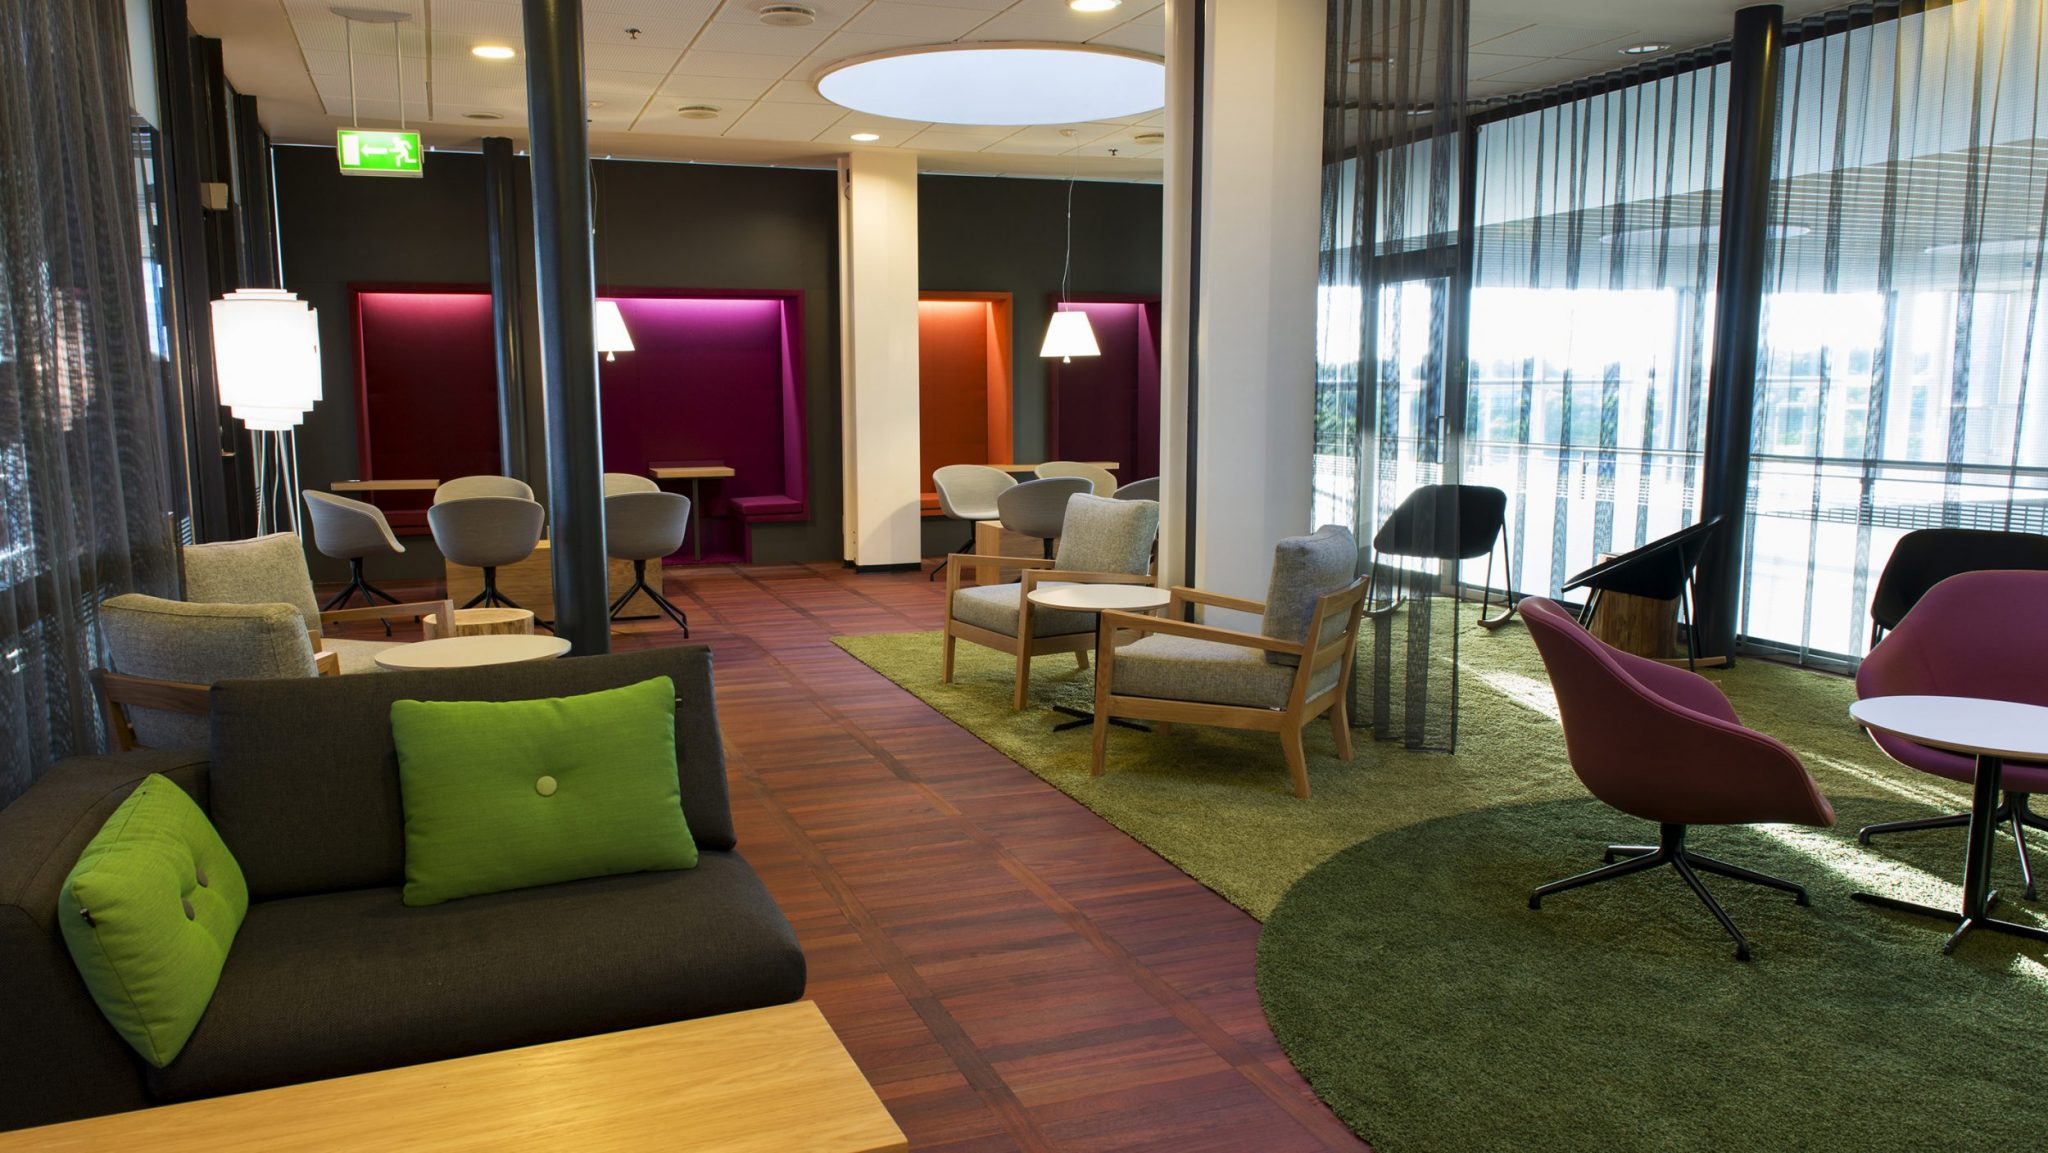 Servisair-Aspire-Airport-Lounge-Copenhagen-Denmark-GI-Project-1